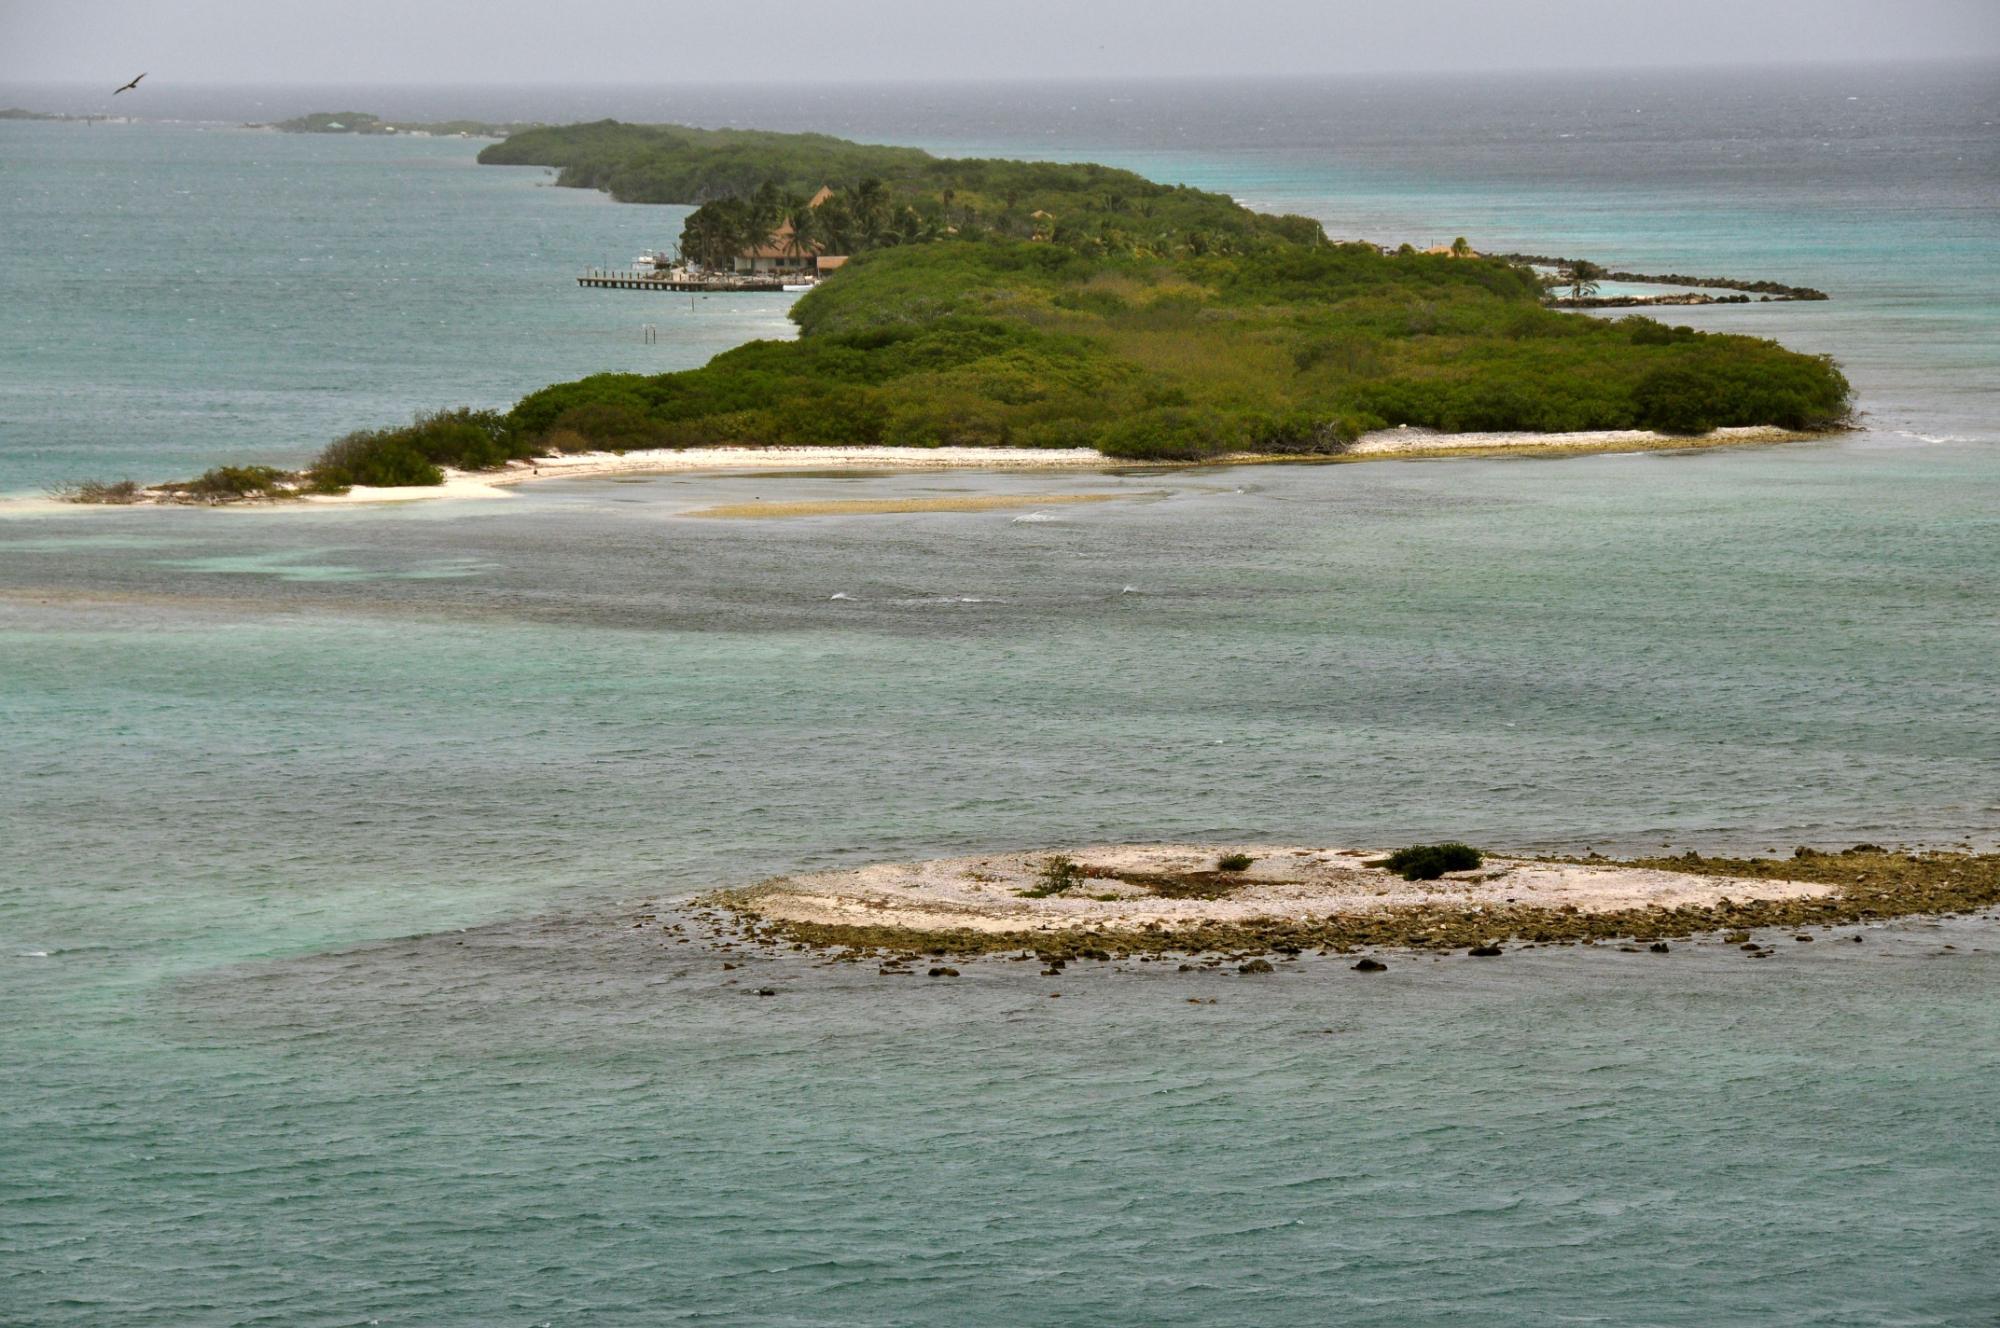 Adios Aruba